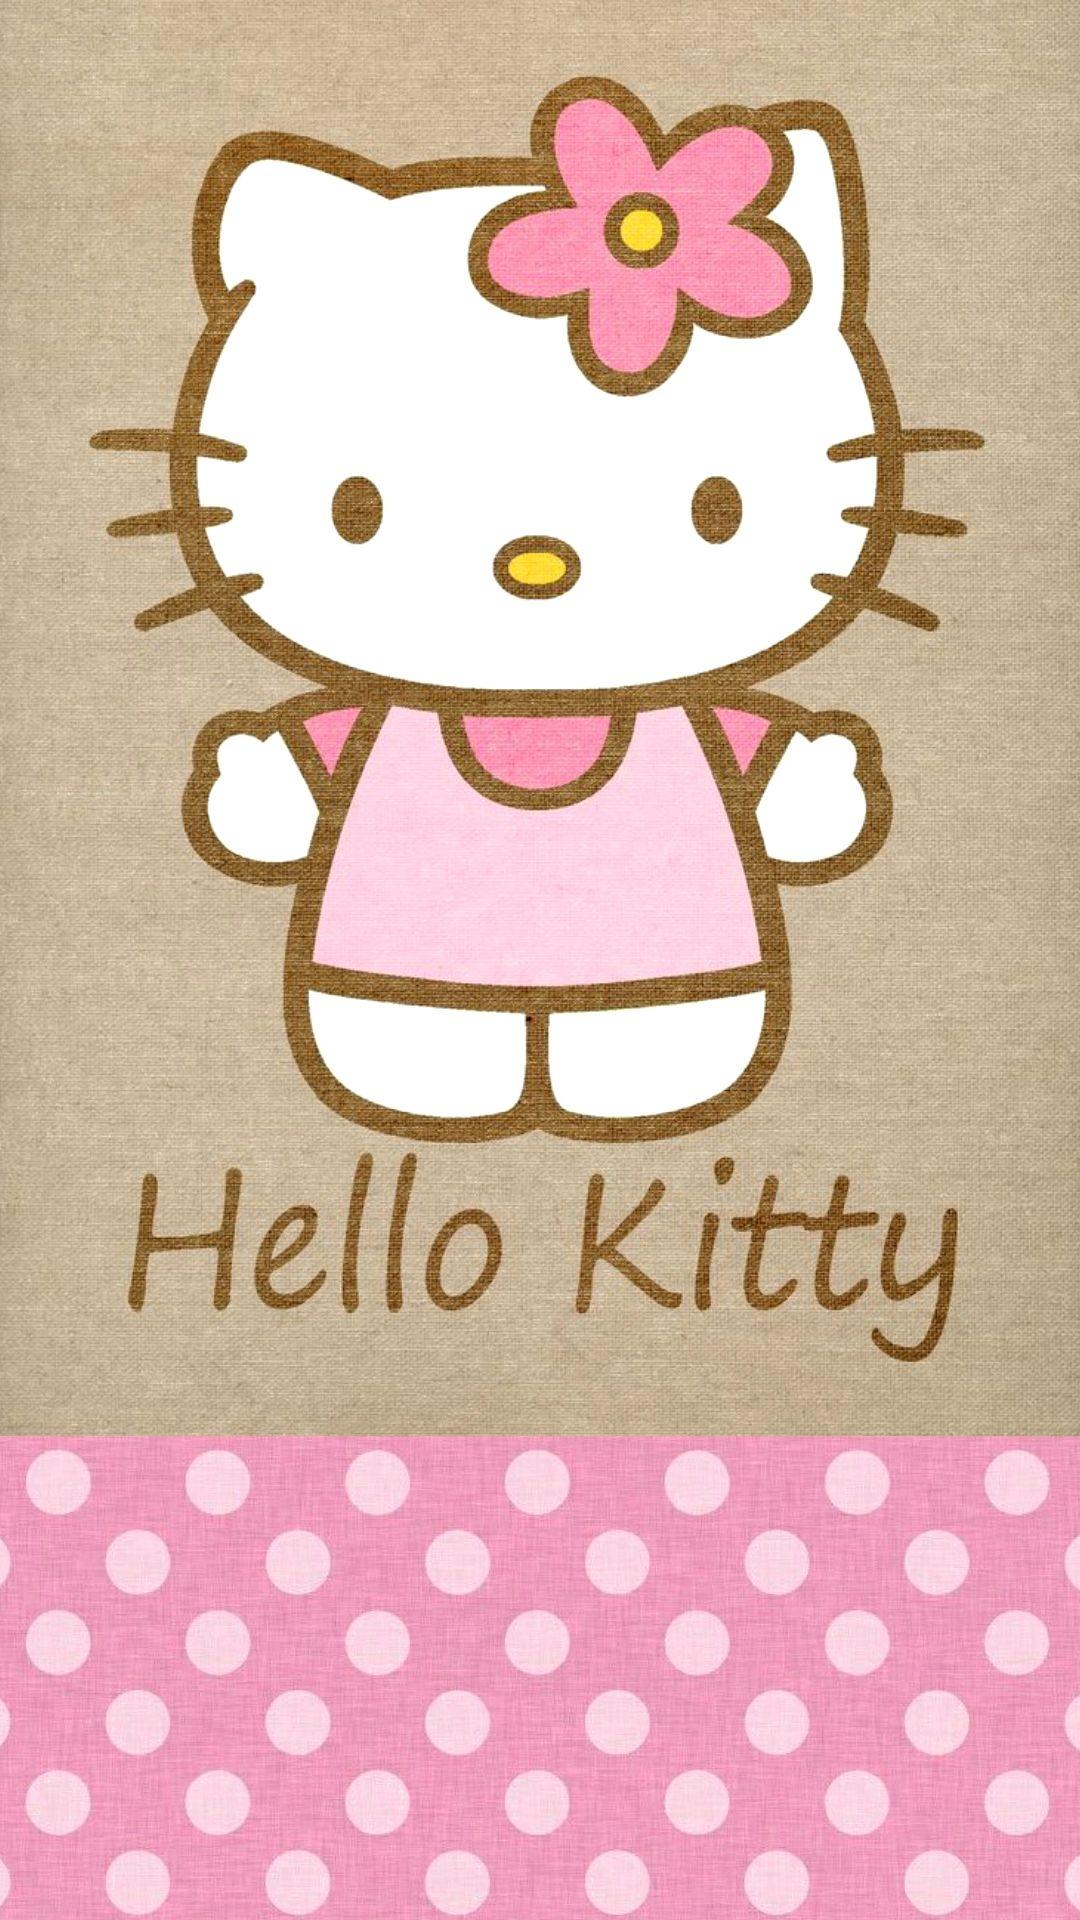 Hellokitty キティ サンリオ 美好